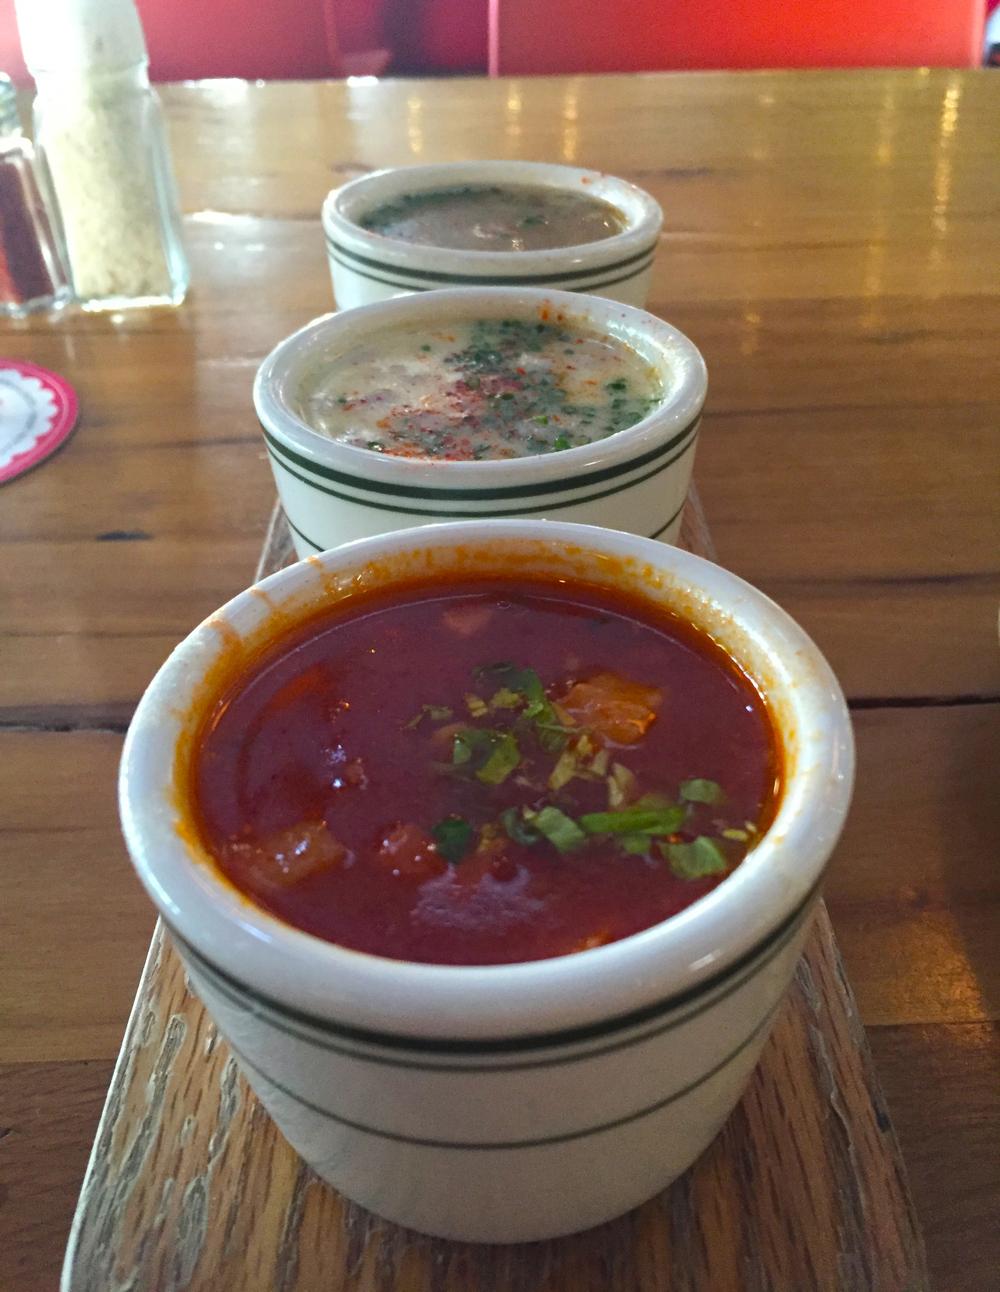 Tasting trio of clam chowder -- Manhattan, New England, and Rhode Island